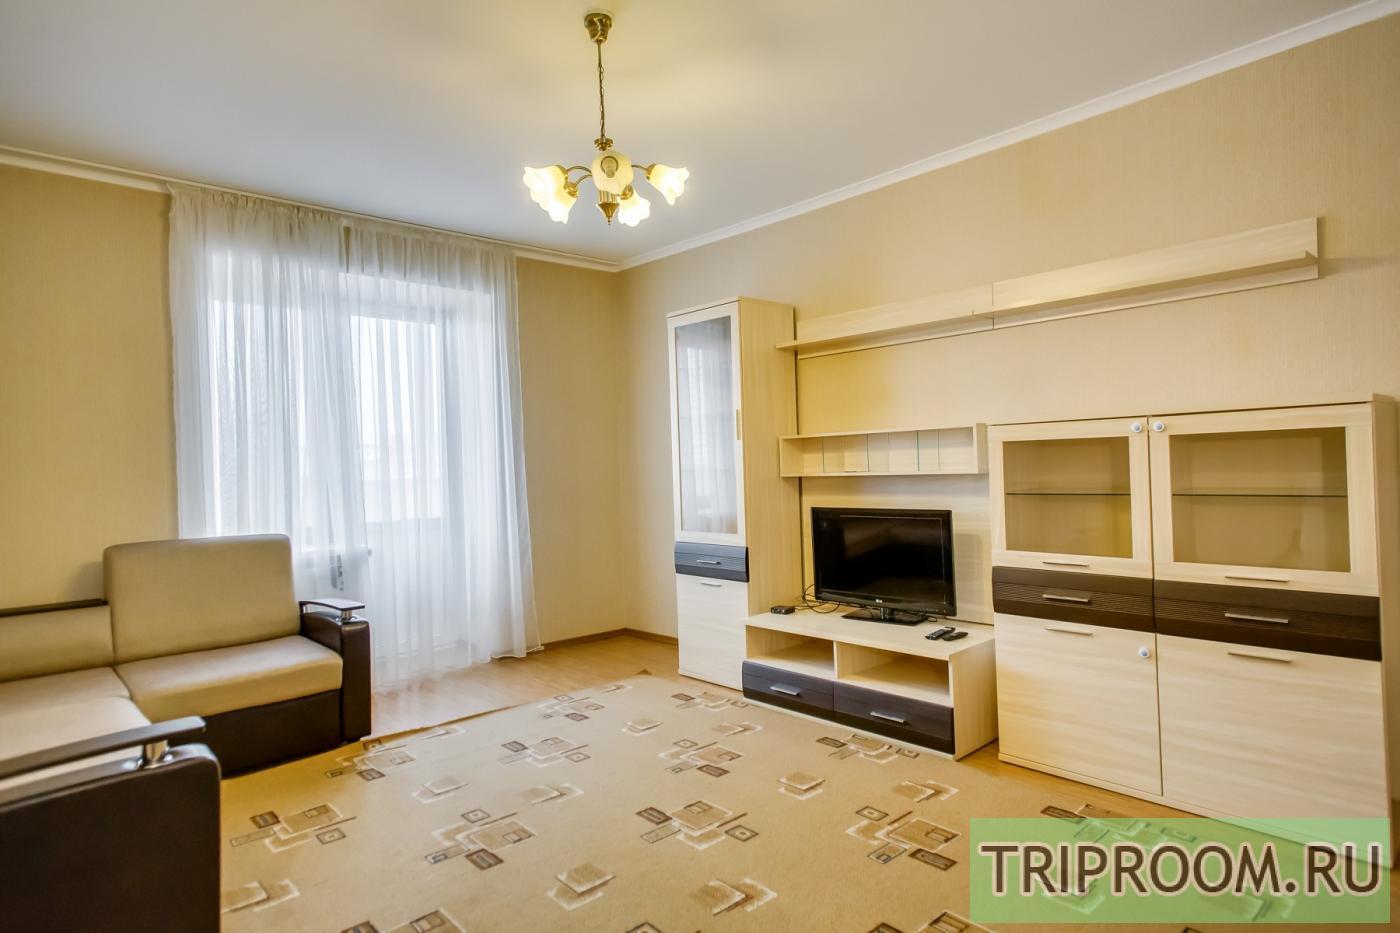 2-комнатная квартира посуточно (вариант № 23730), ул. Максима Горького улица, фото № 4